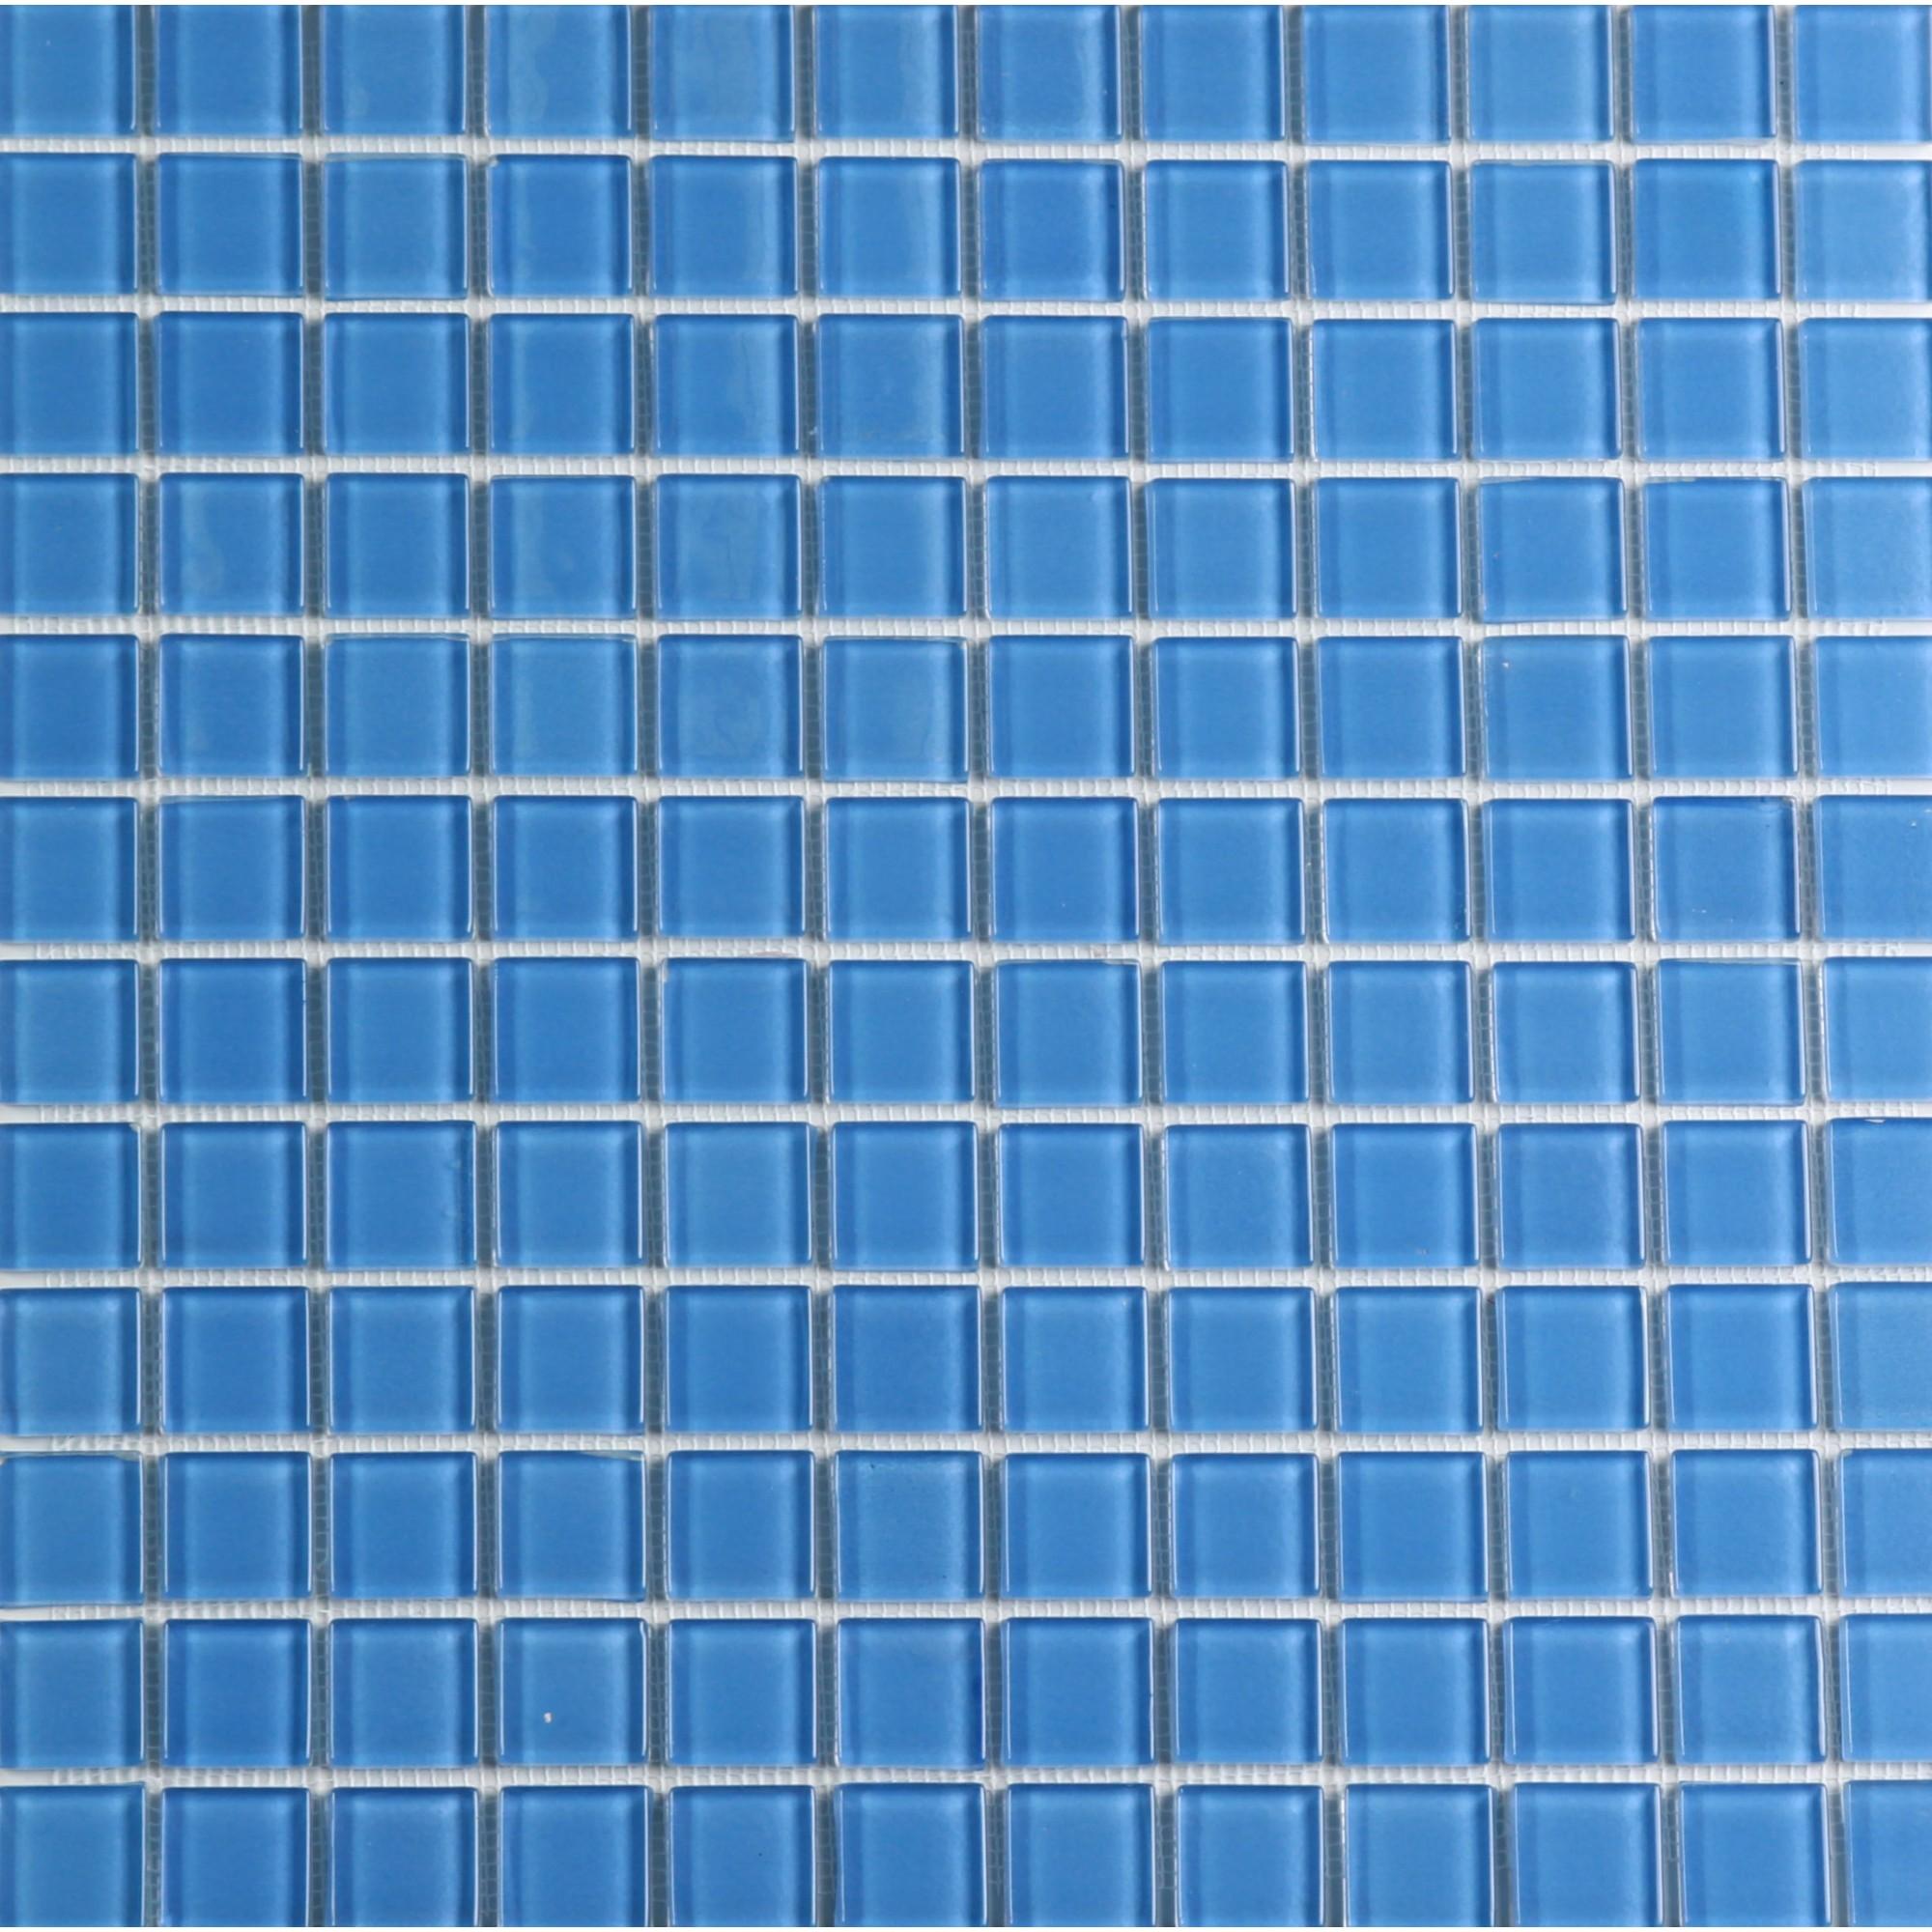 Pastilha de Vidro Brilhante 23x23cm Azul - VT0320C0034 - Vetromani